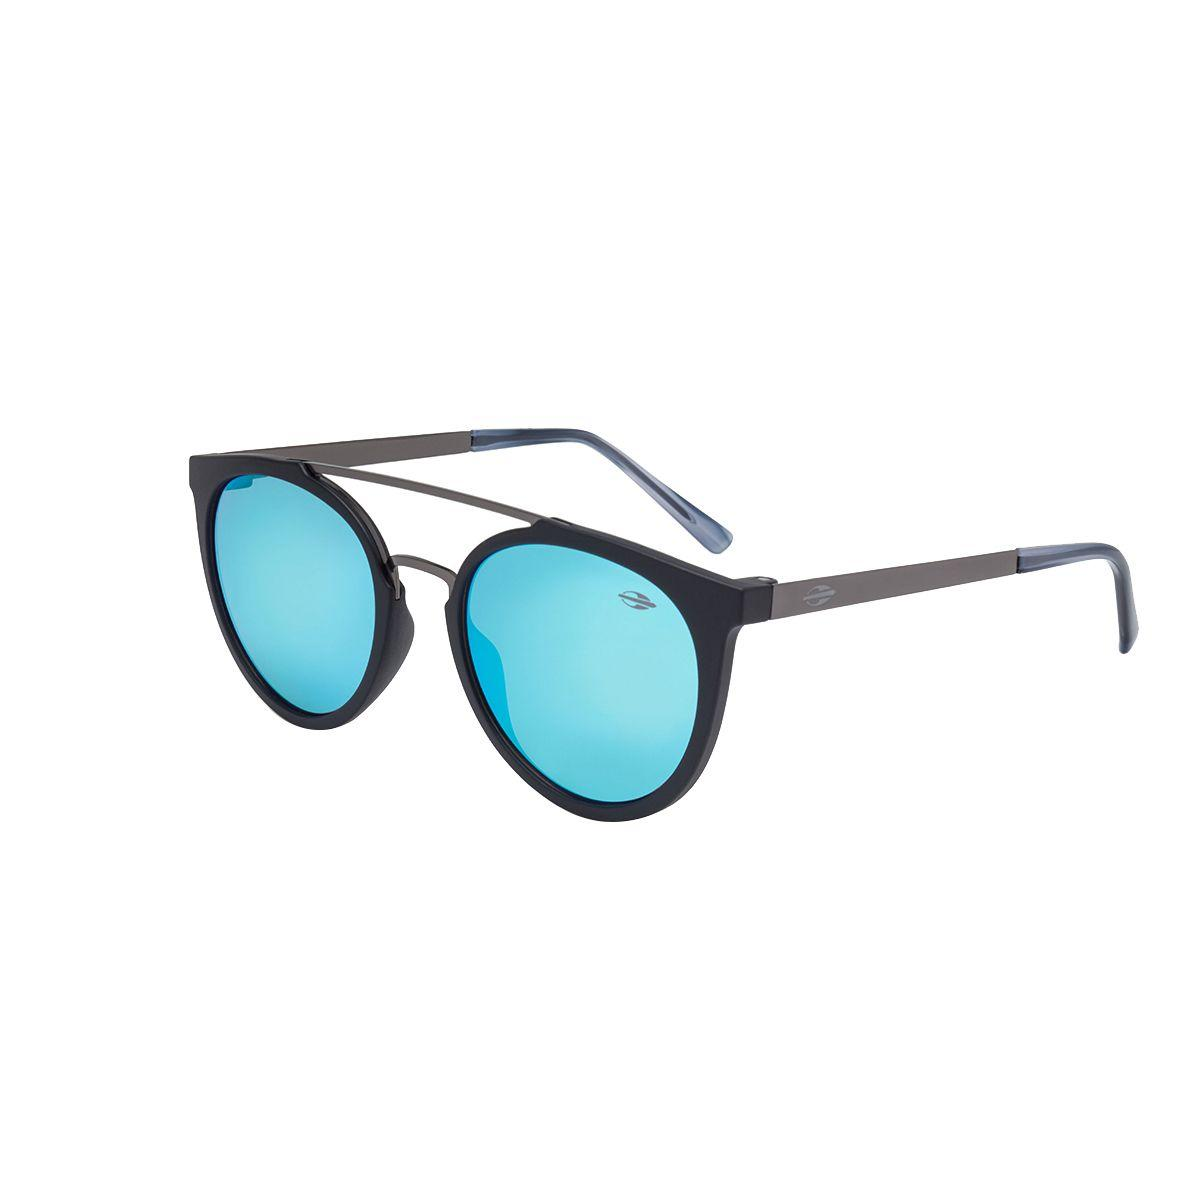 c745ac100b042 Óculos De Sol Los Angeles Preto Fosco Lente Espelhada Azul Mormaii R   349